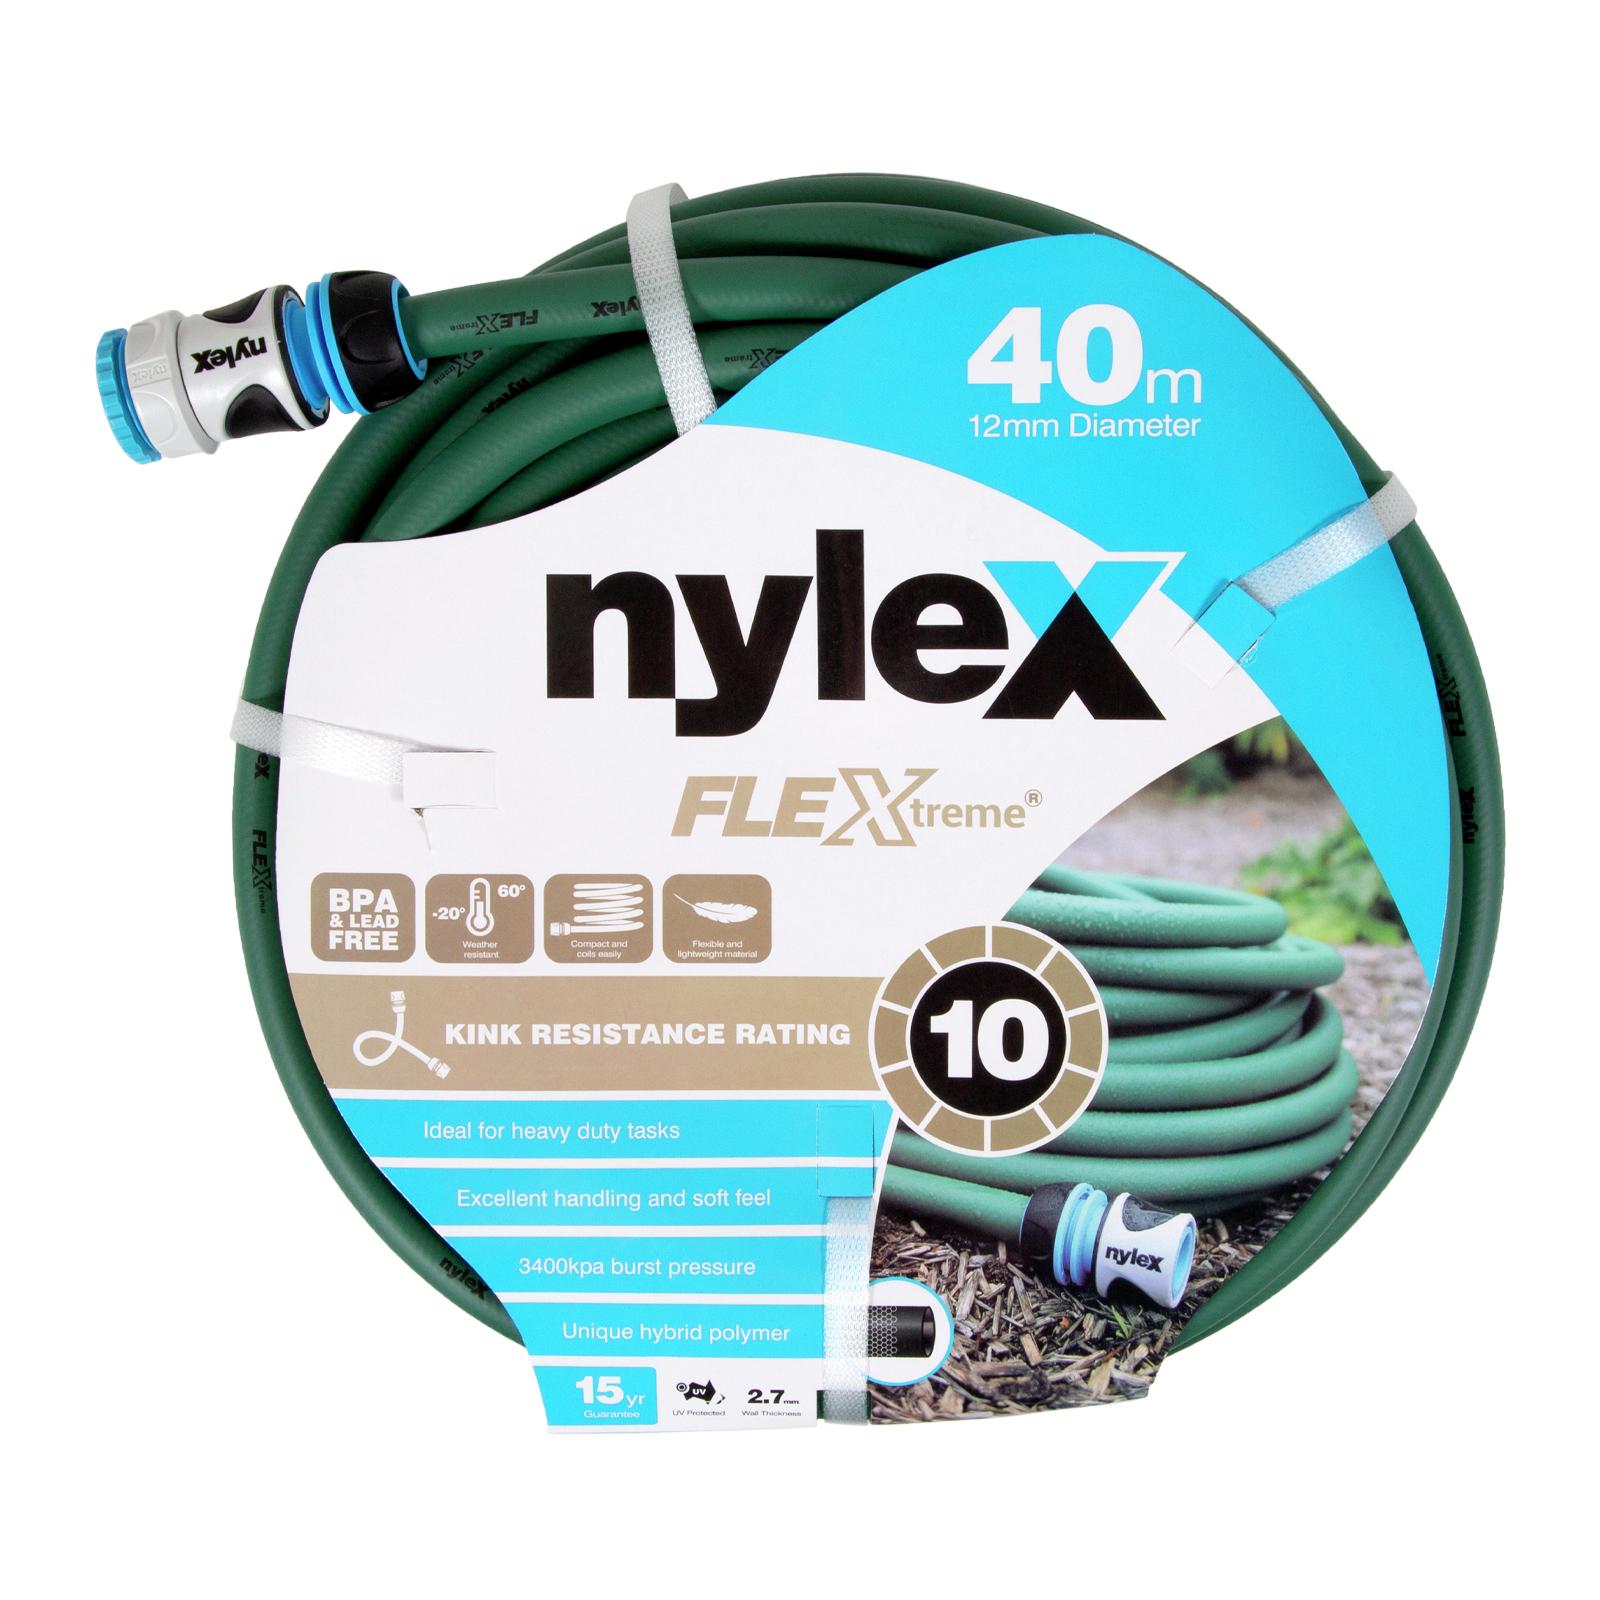 Nylex Flextreme 40m Garden Hose